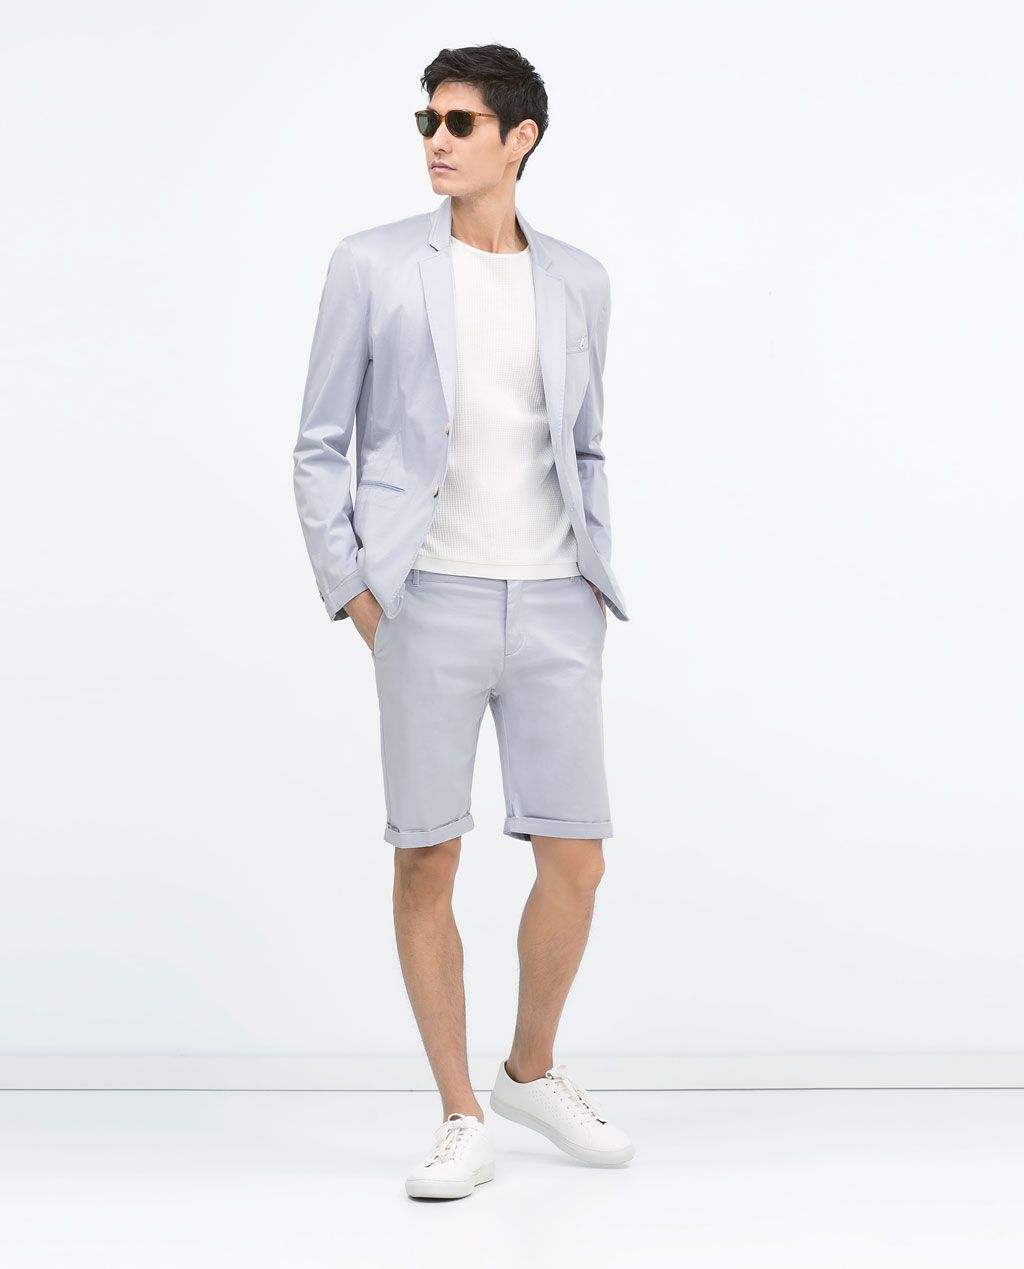 a254d618b1676 Vêtements D été · Satin · SATIN BERMUDA SHORTS from Zara Zara Homme, Veste  Homme, Gilet De Mariage, Costumes